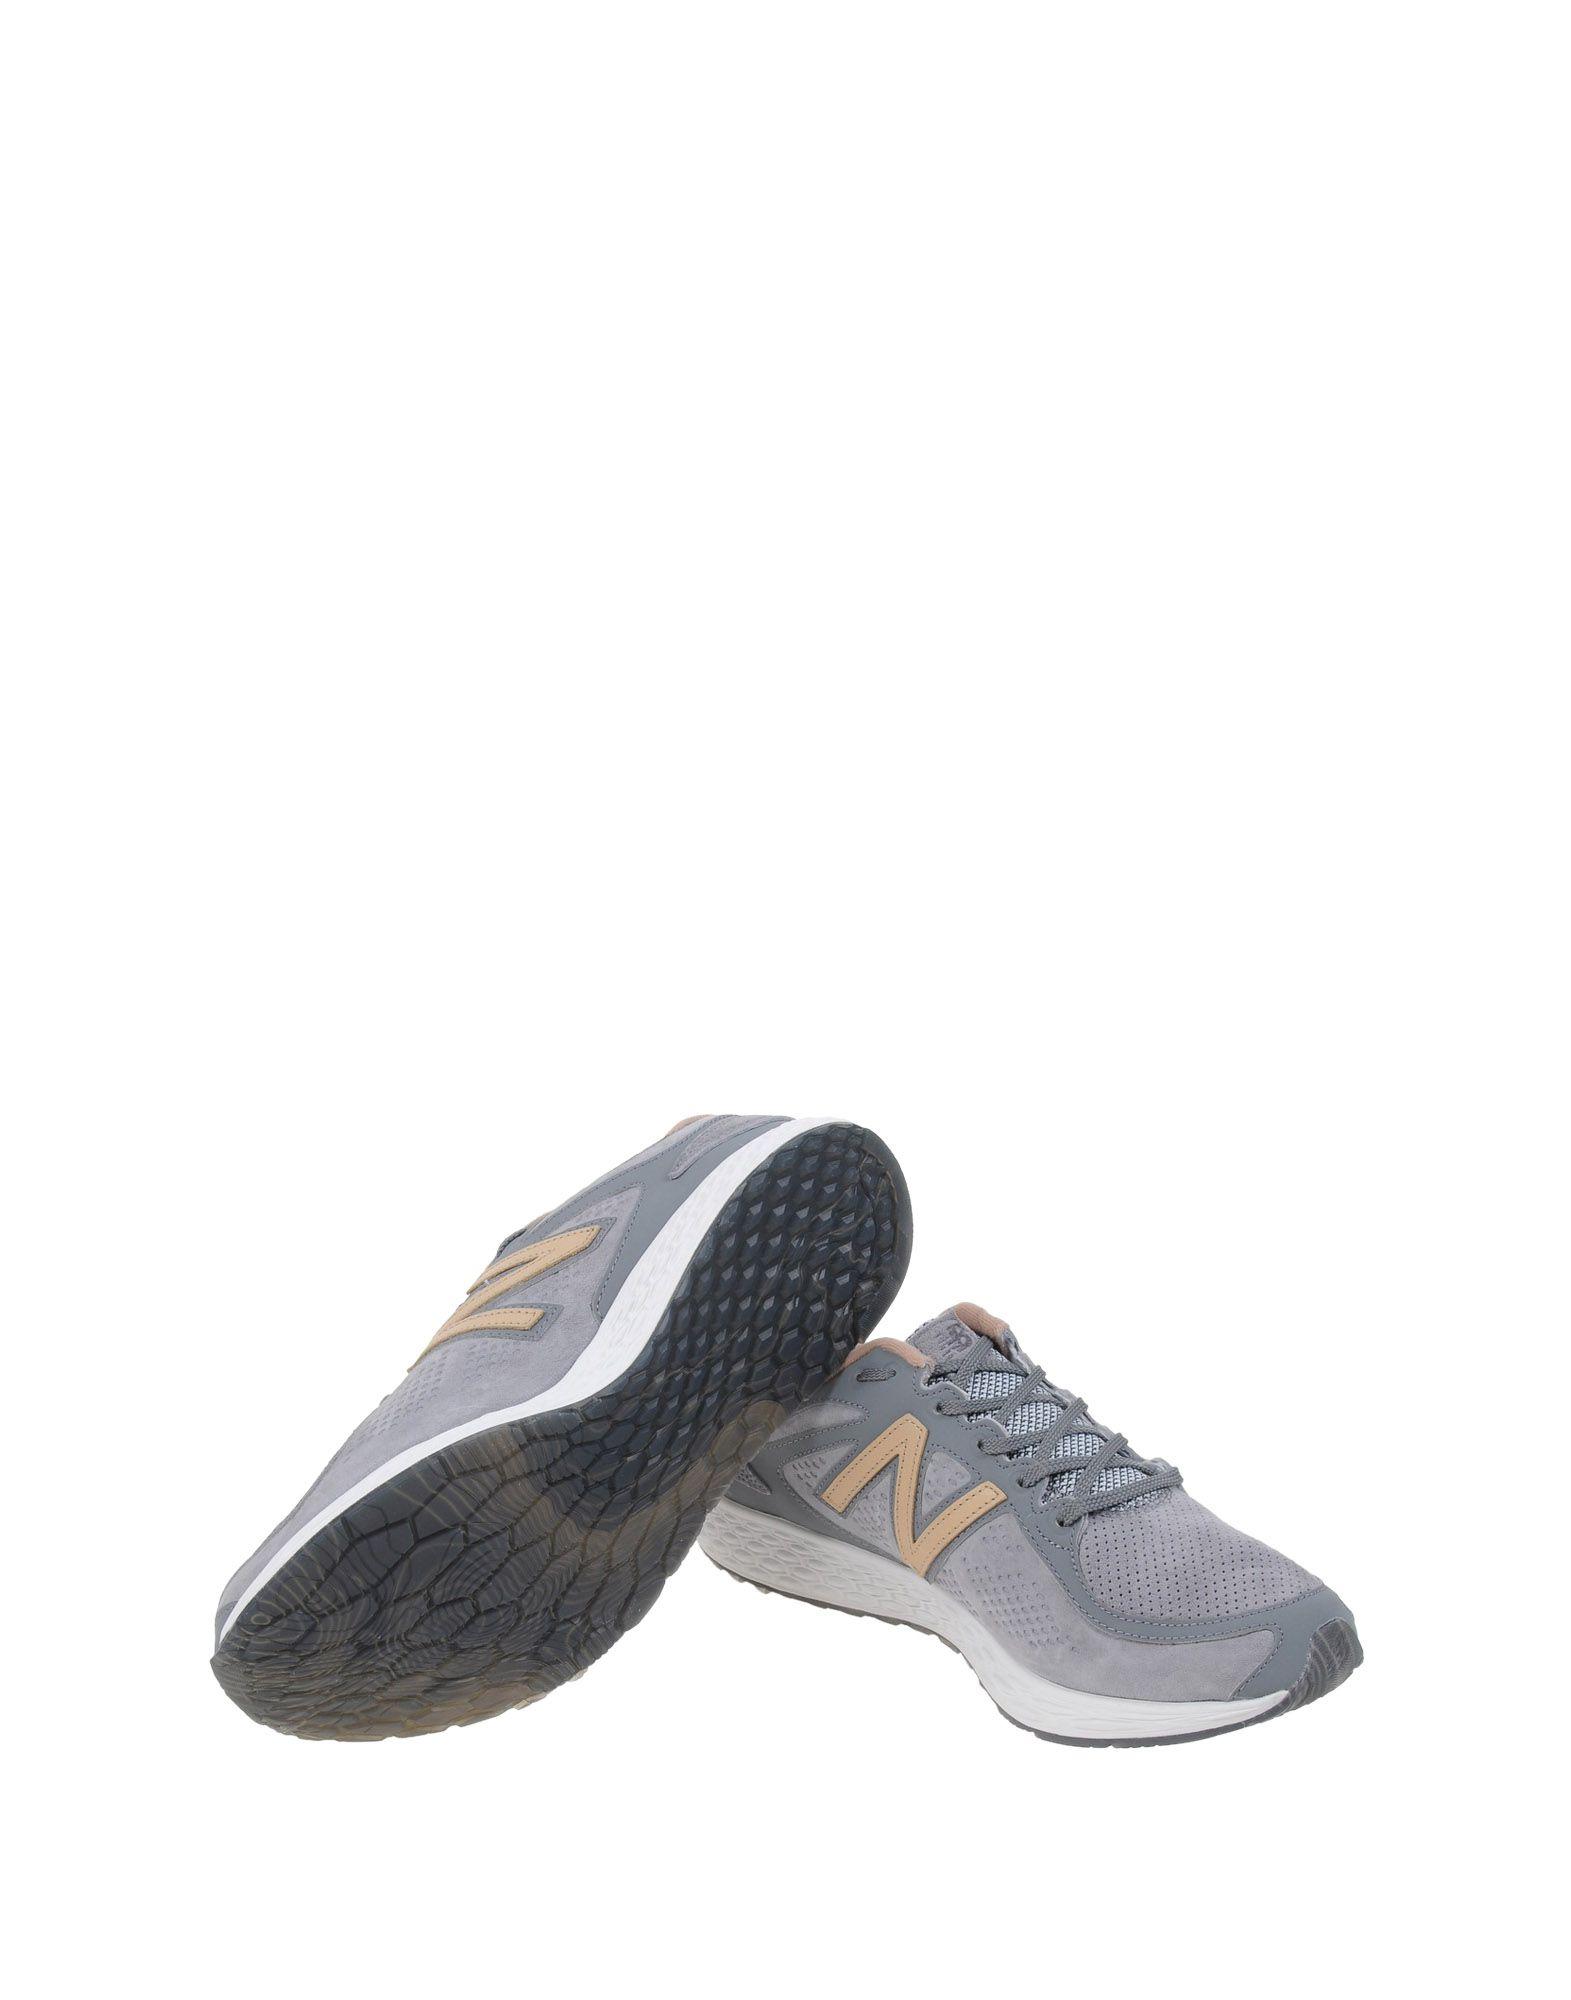 Haltbare Mode billige Schuhe New Balance Zante Heiße  11089271RL Heiße Zante Schuhe 012e84